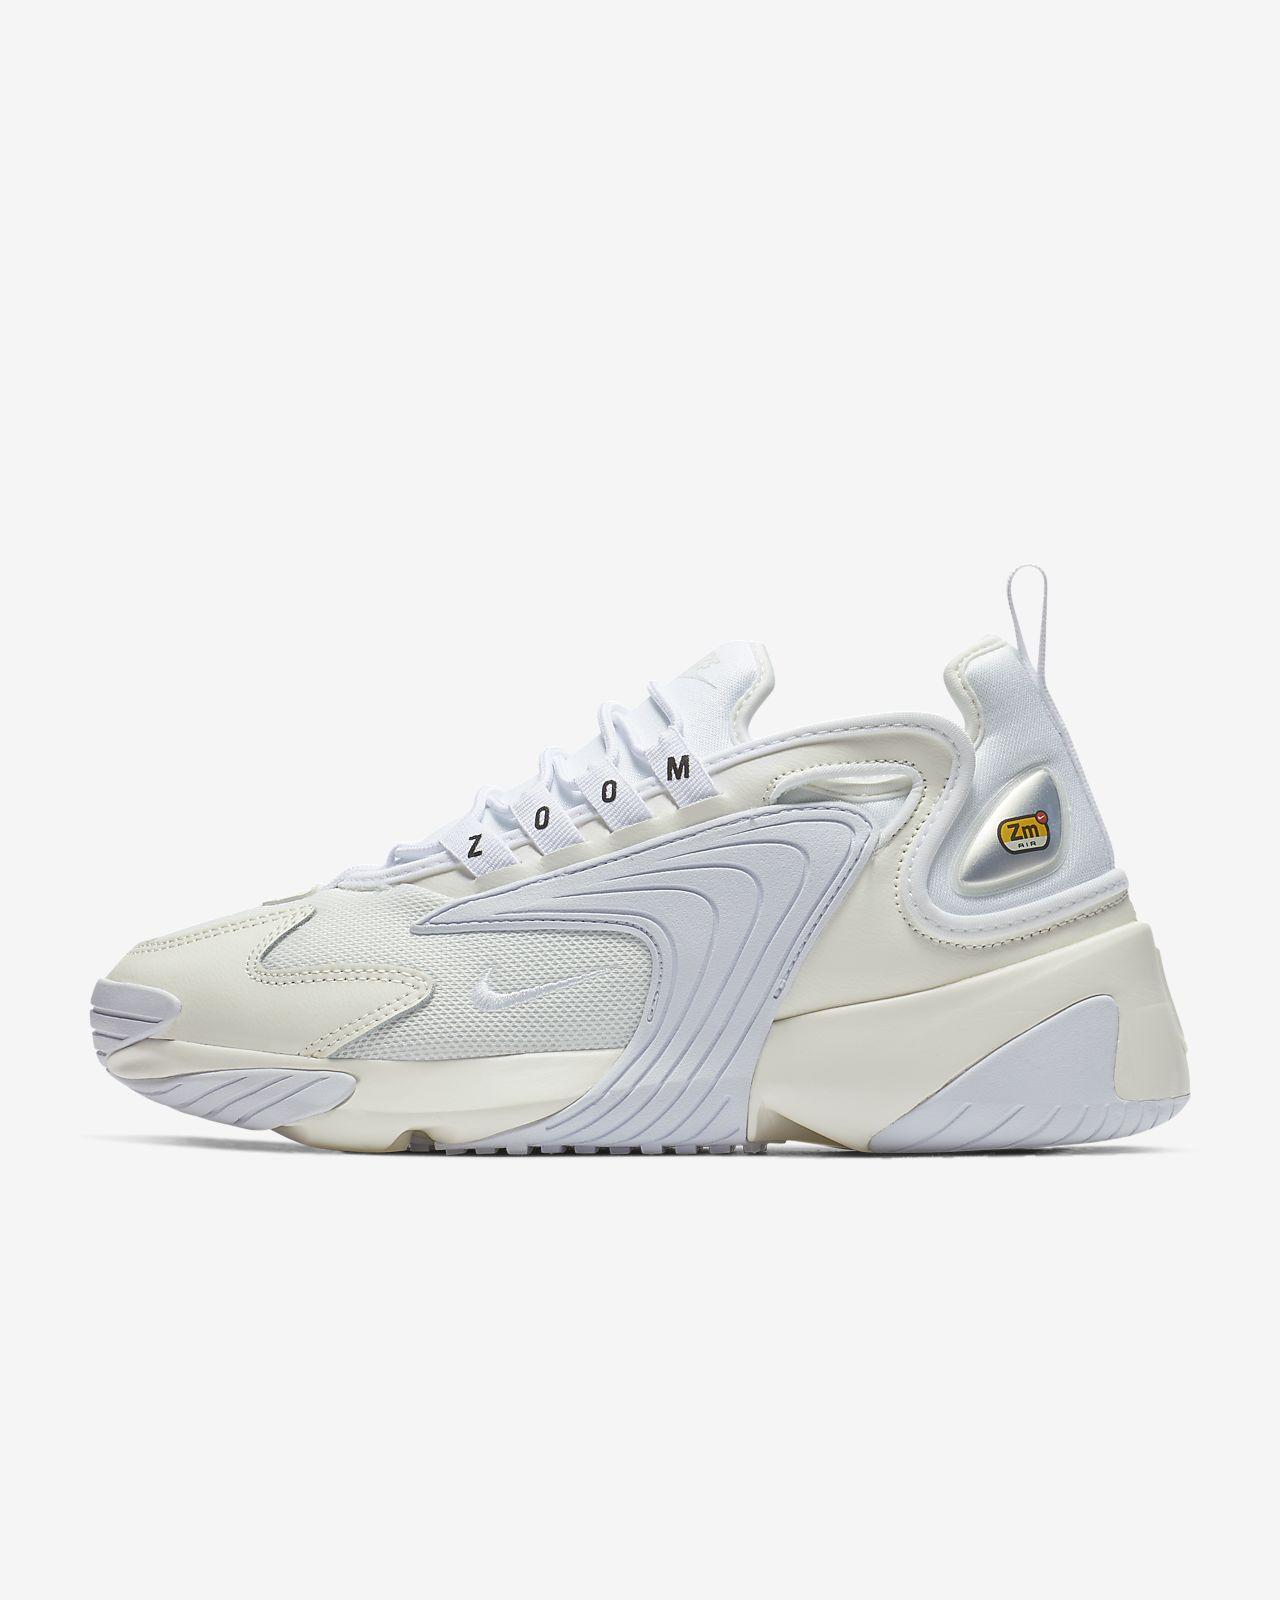 Nike Zoom 2K Damenschuh